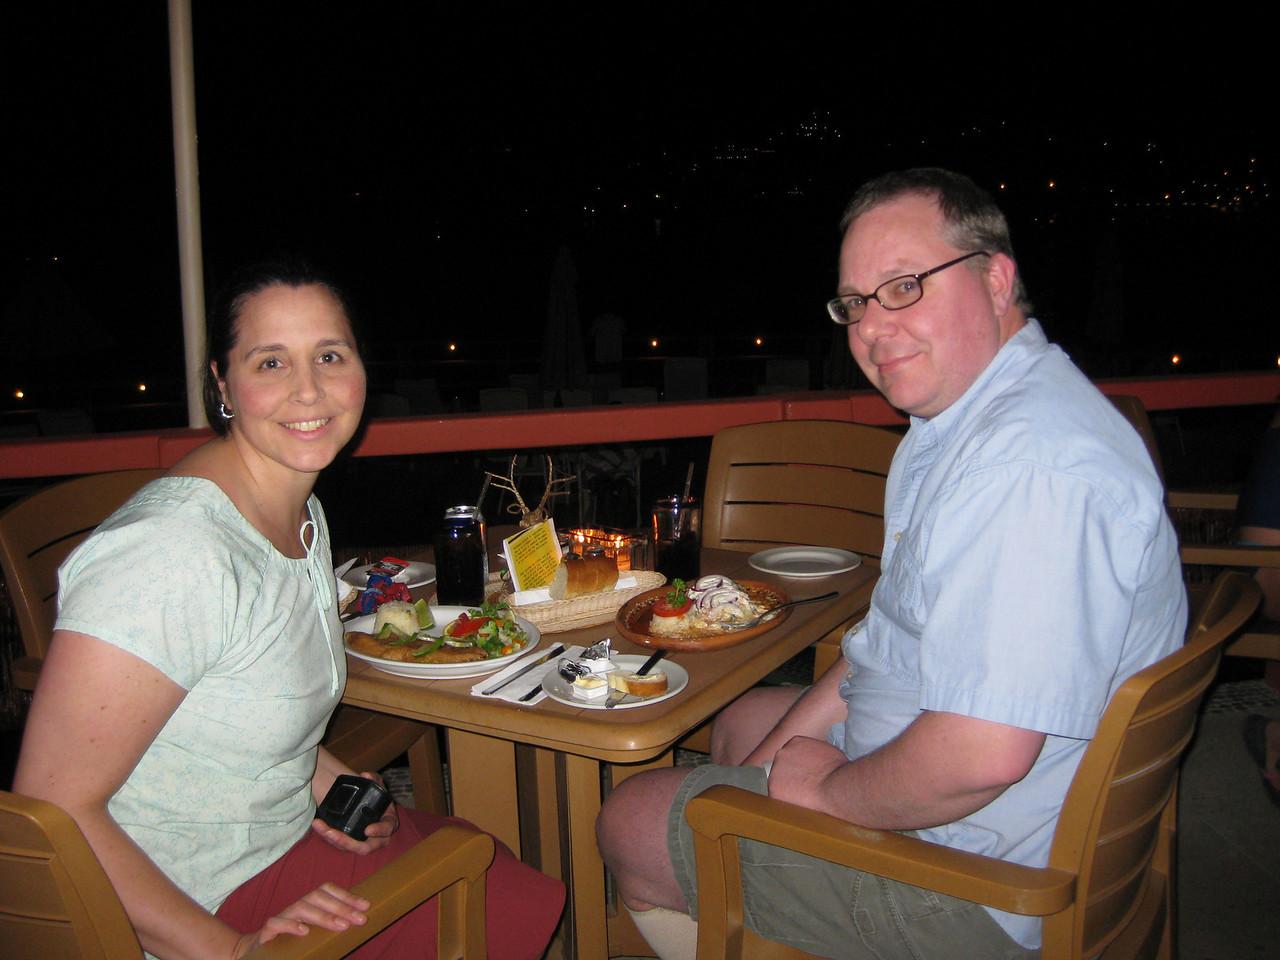 Dinner at Hotel Irma